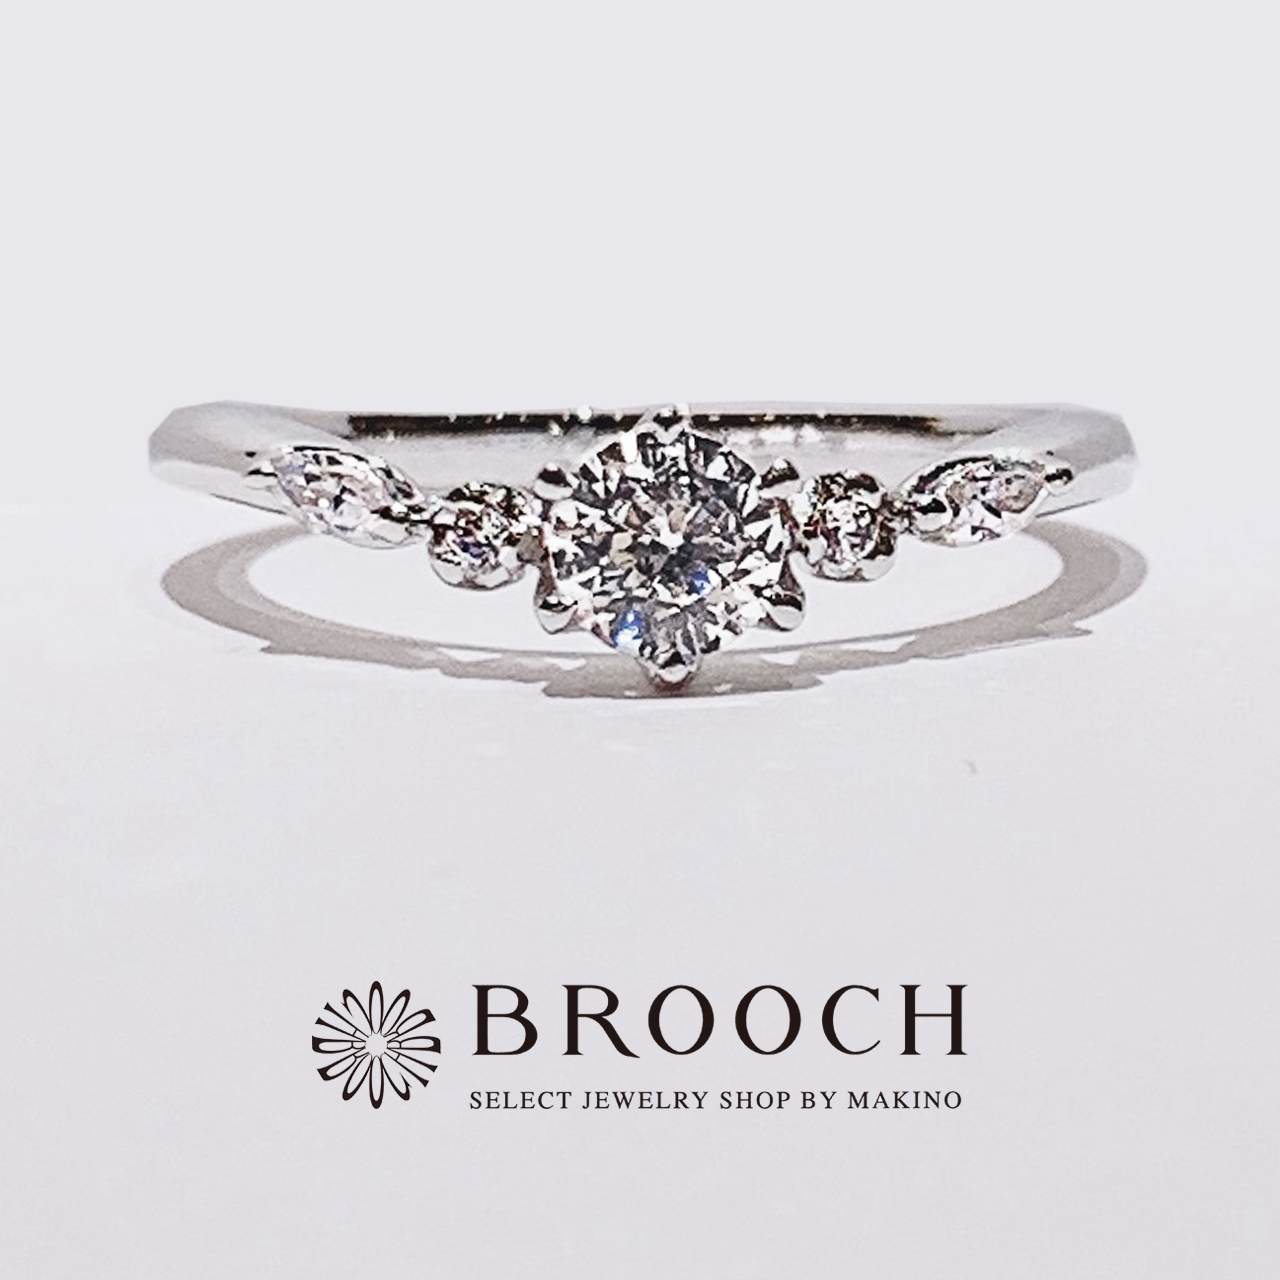 BROOCH 婚約指輪 エンゲージリング 華やかV字デザイン